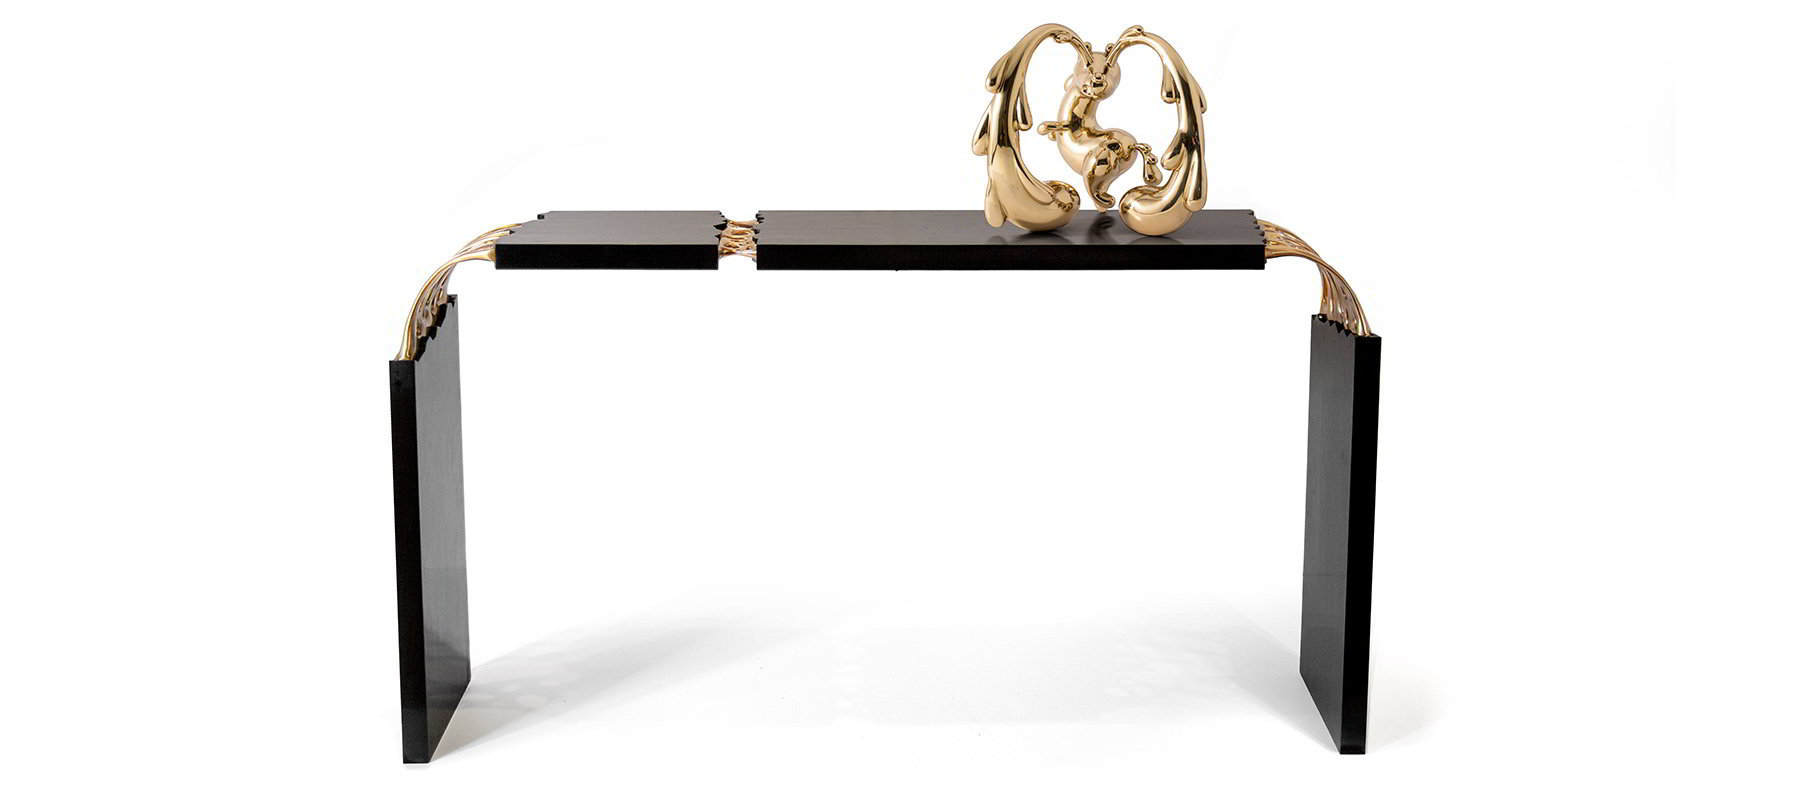 Broken Monolith table with unicorn bronze sculpture and wood sculpture